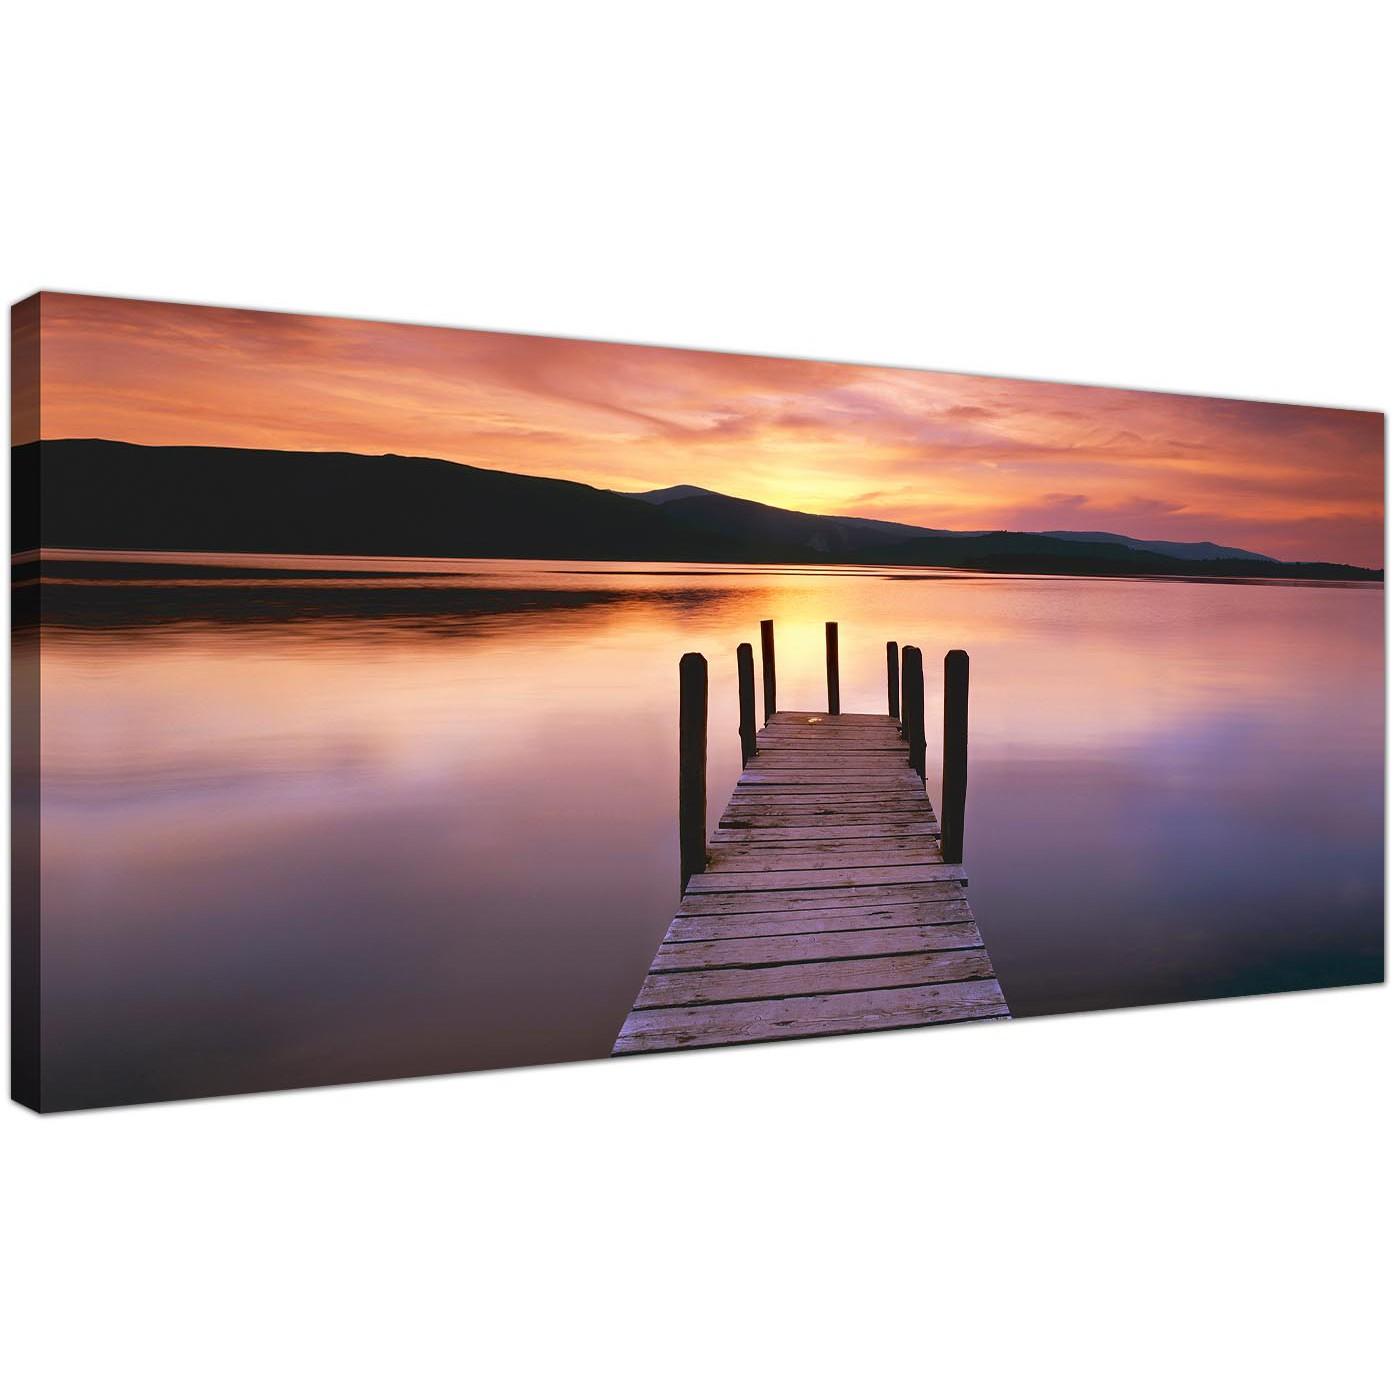 Cheap Canvas Prints Orange Panoramic Landscape 1214 Display Gallery Item 1  ...